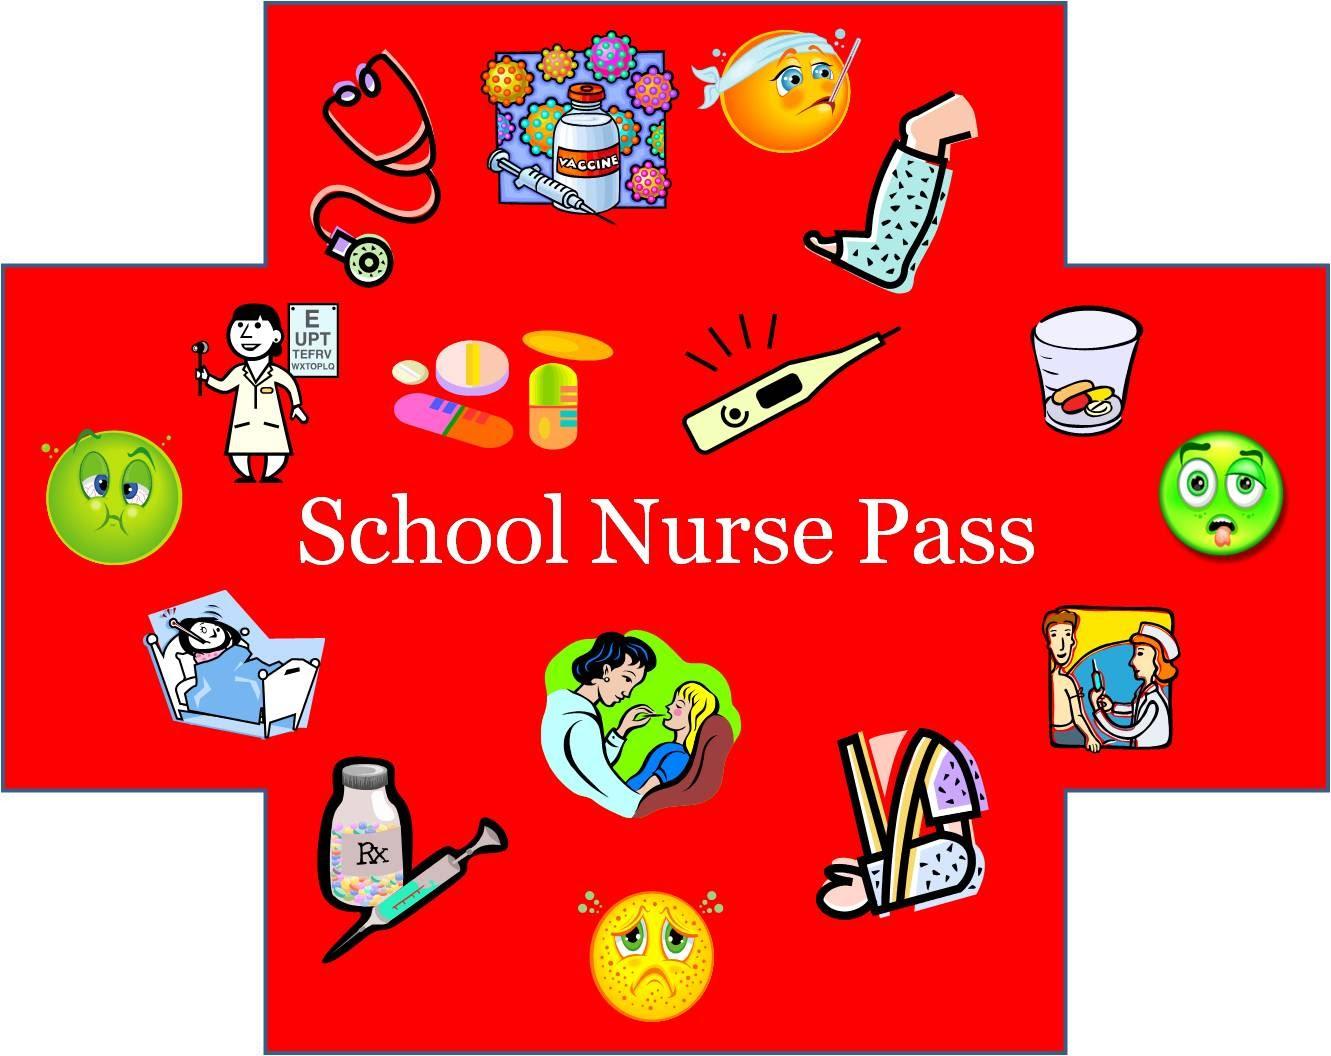 hight resolution of school nurse pass clipart